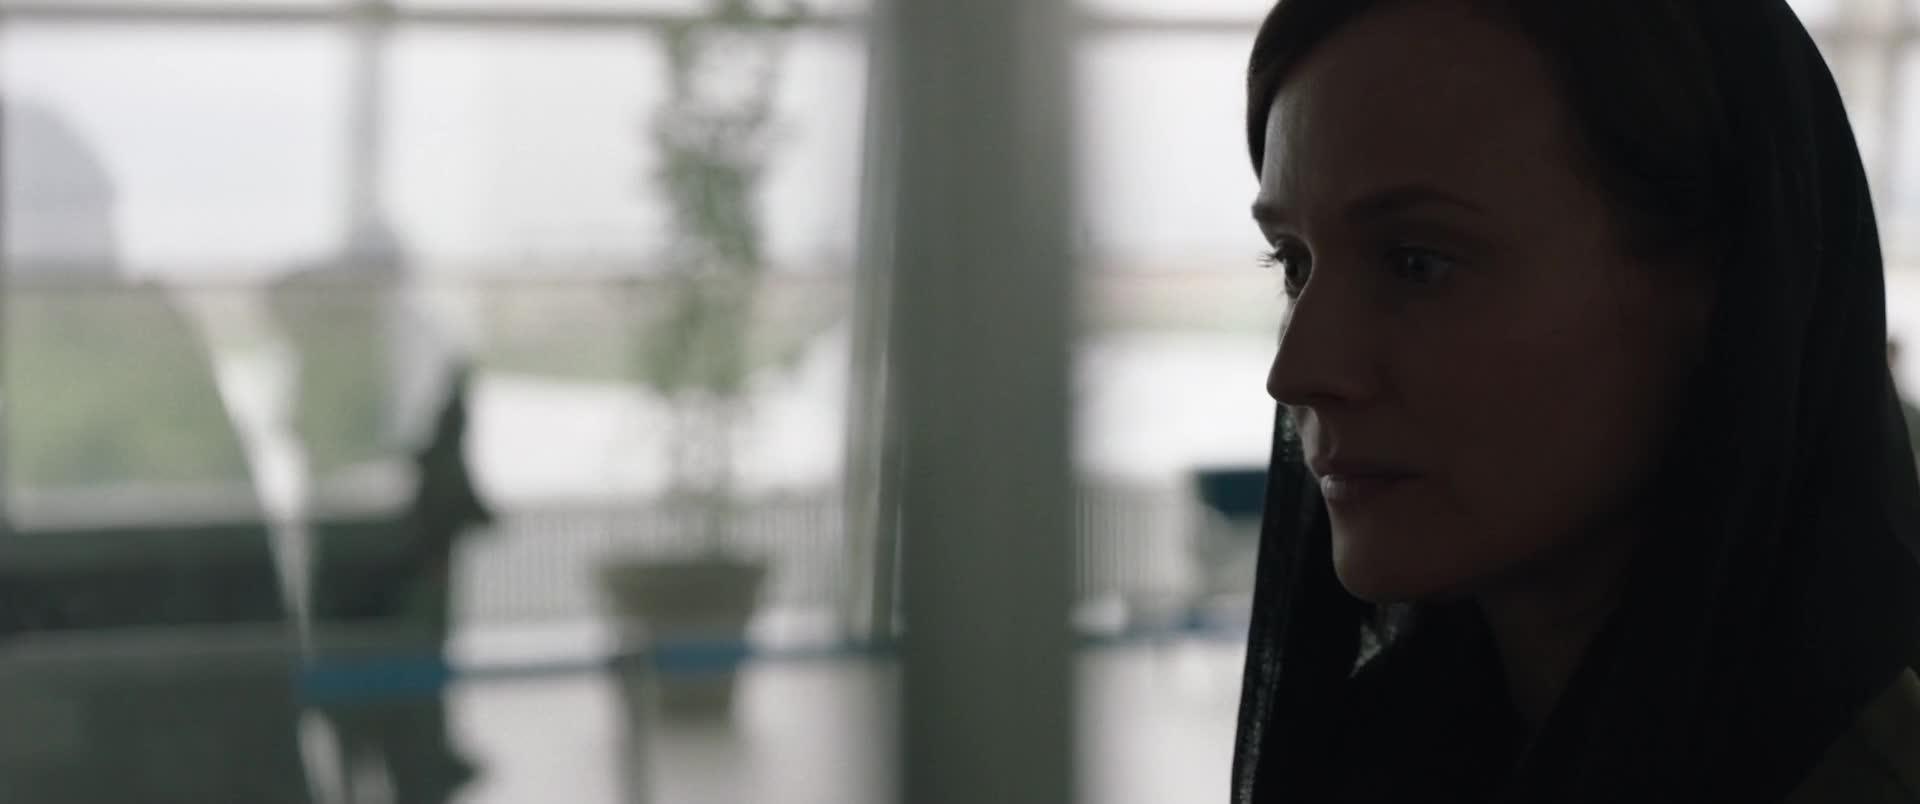 Agentka v utajeni 2019 CZ titulky HD